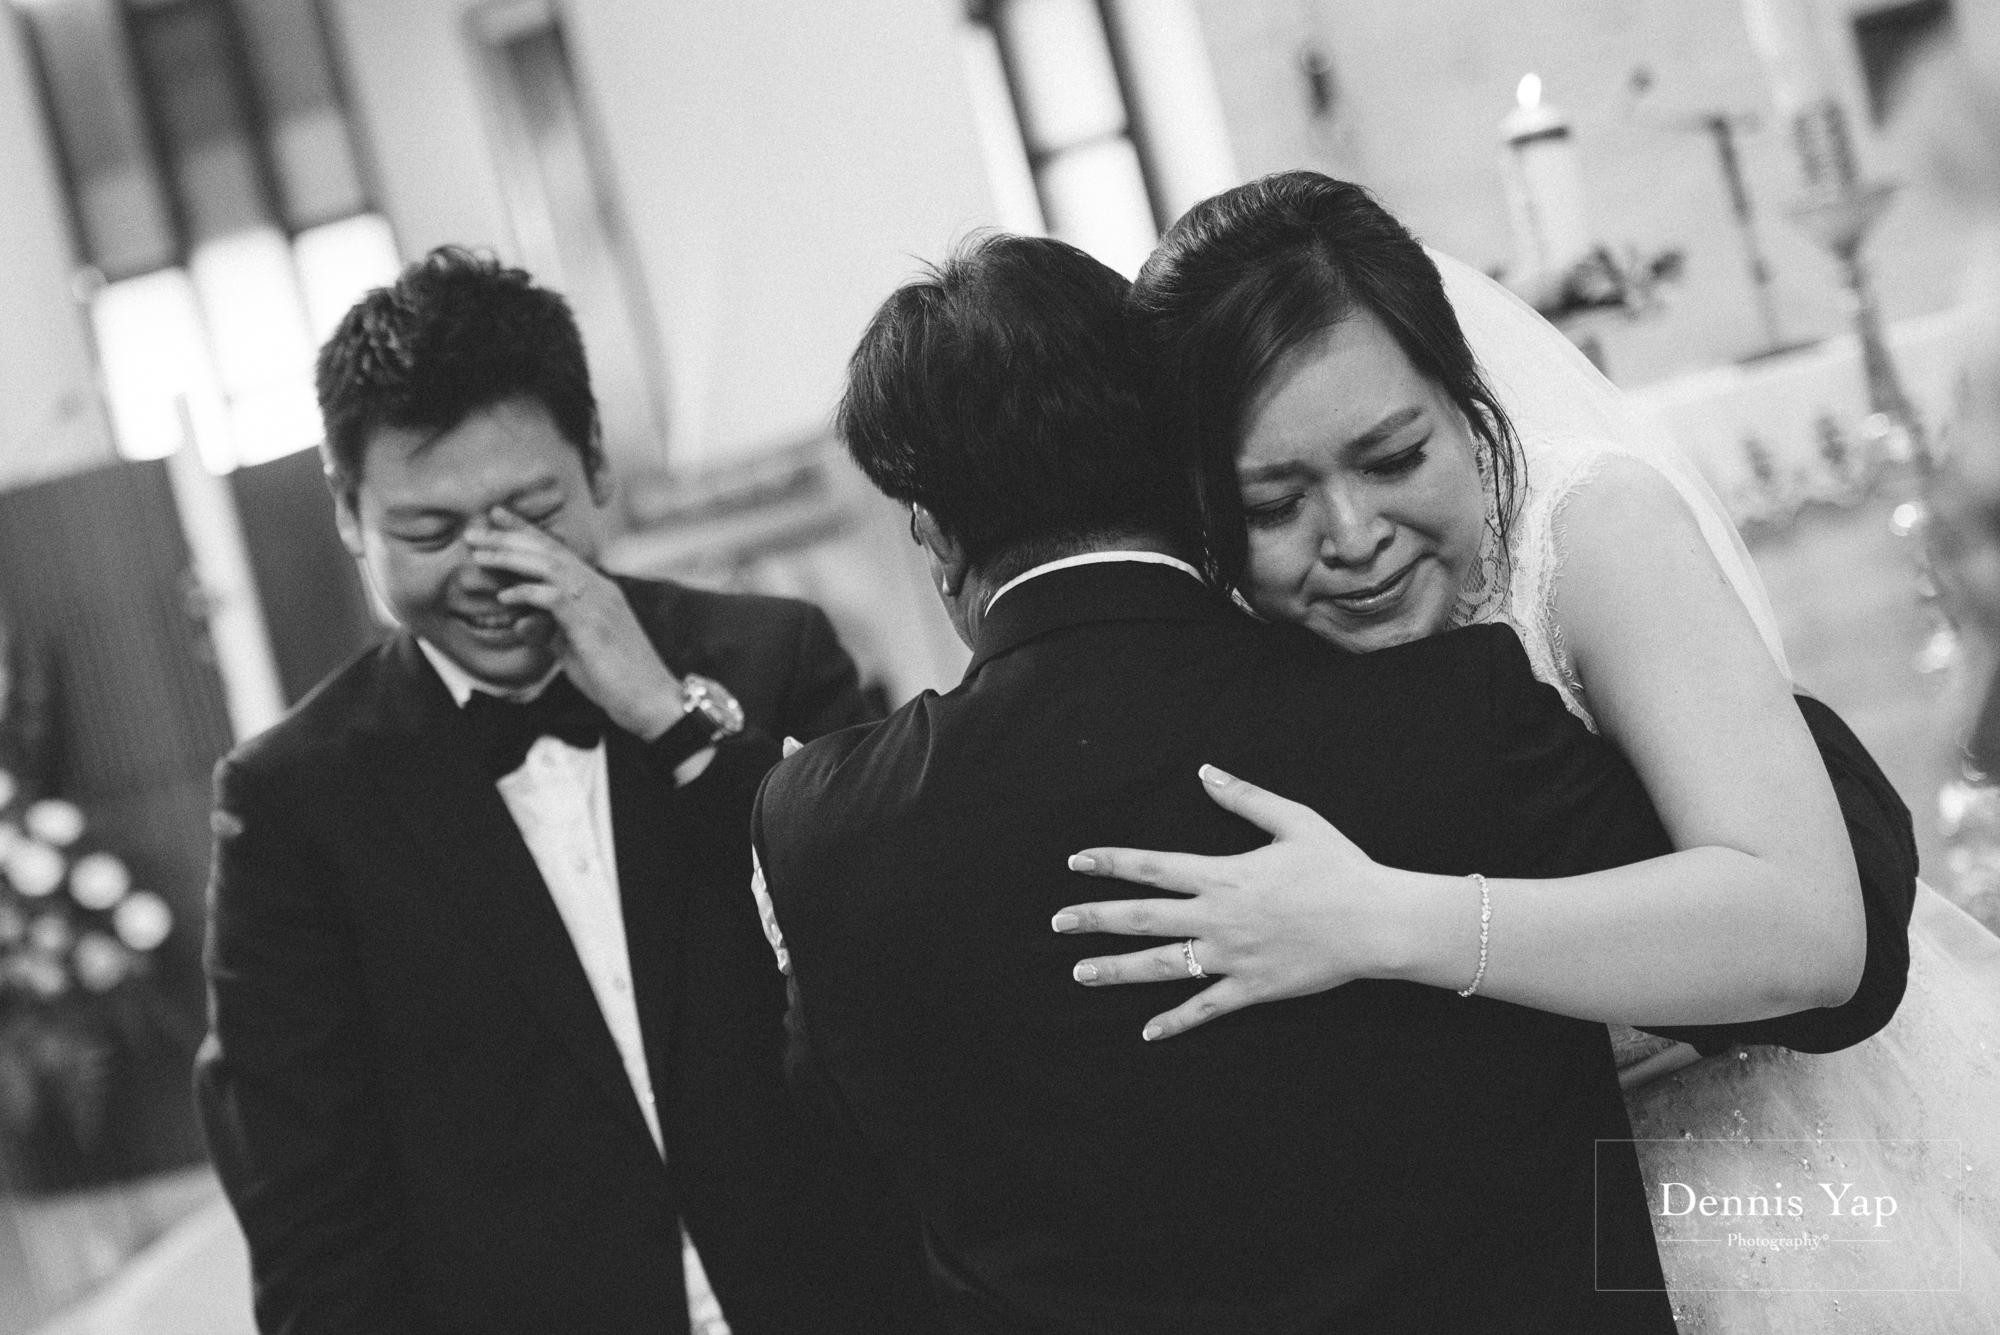 ino sheri black white church wedding st thomas more subang jaya dennis yap photography touching love beloved australia indonesia-34.jpg